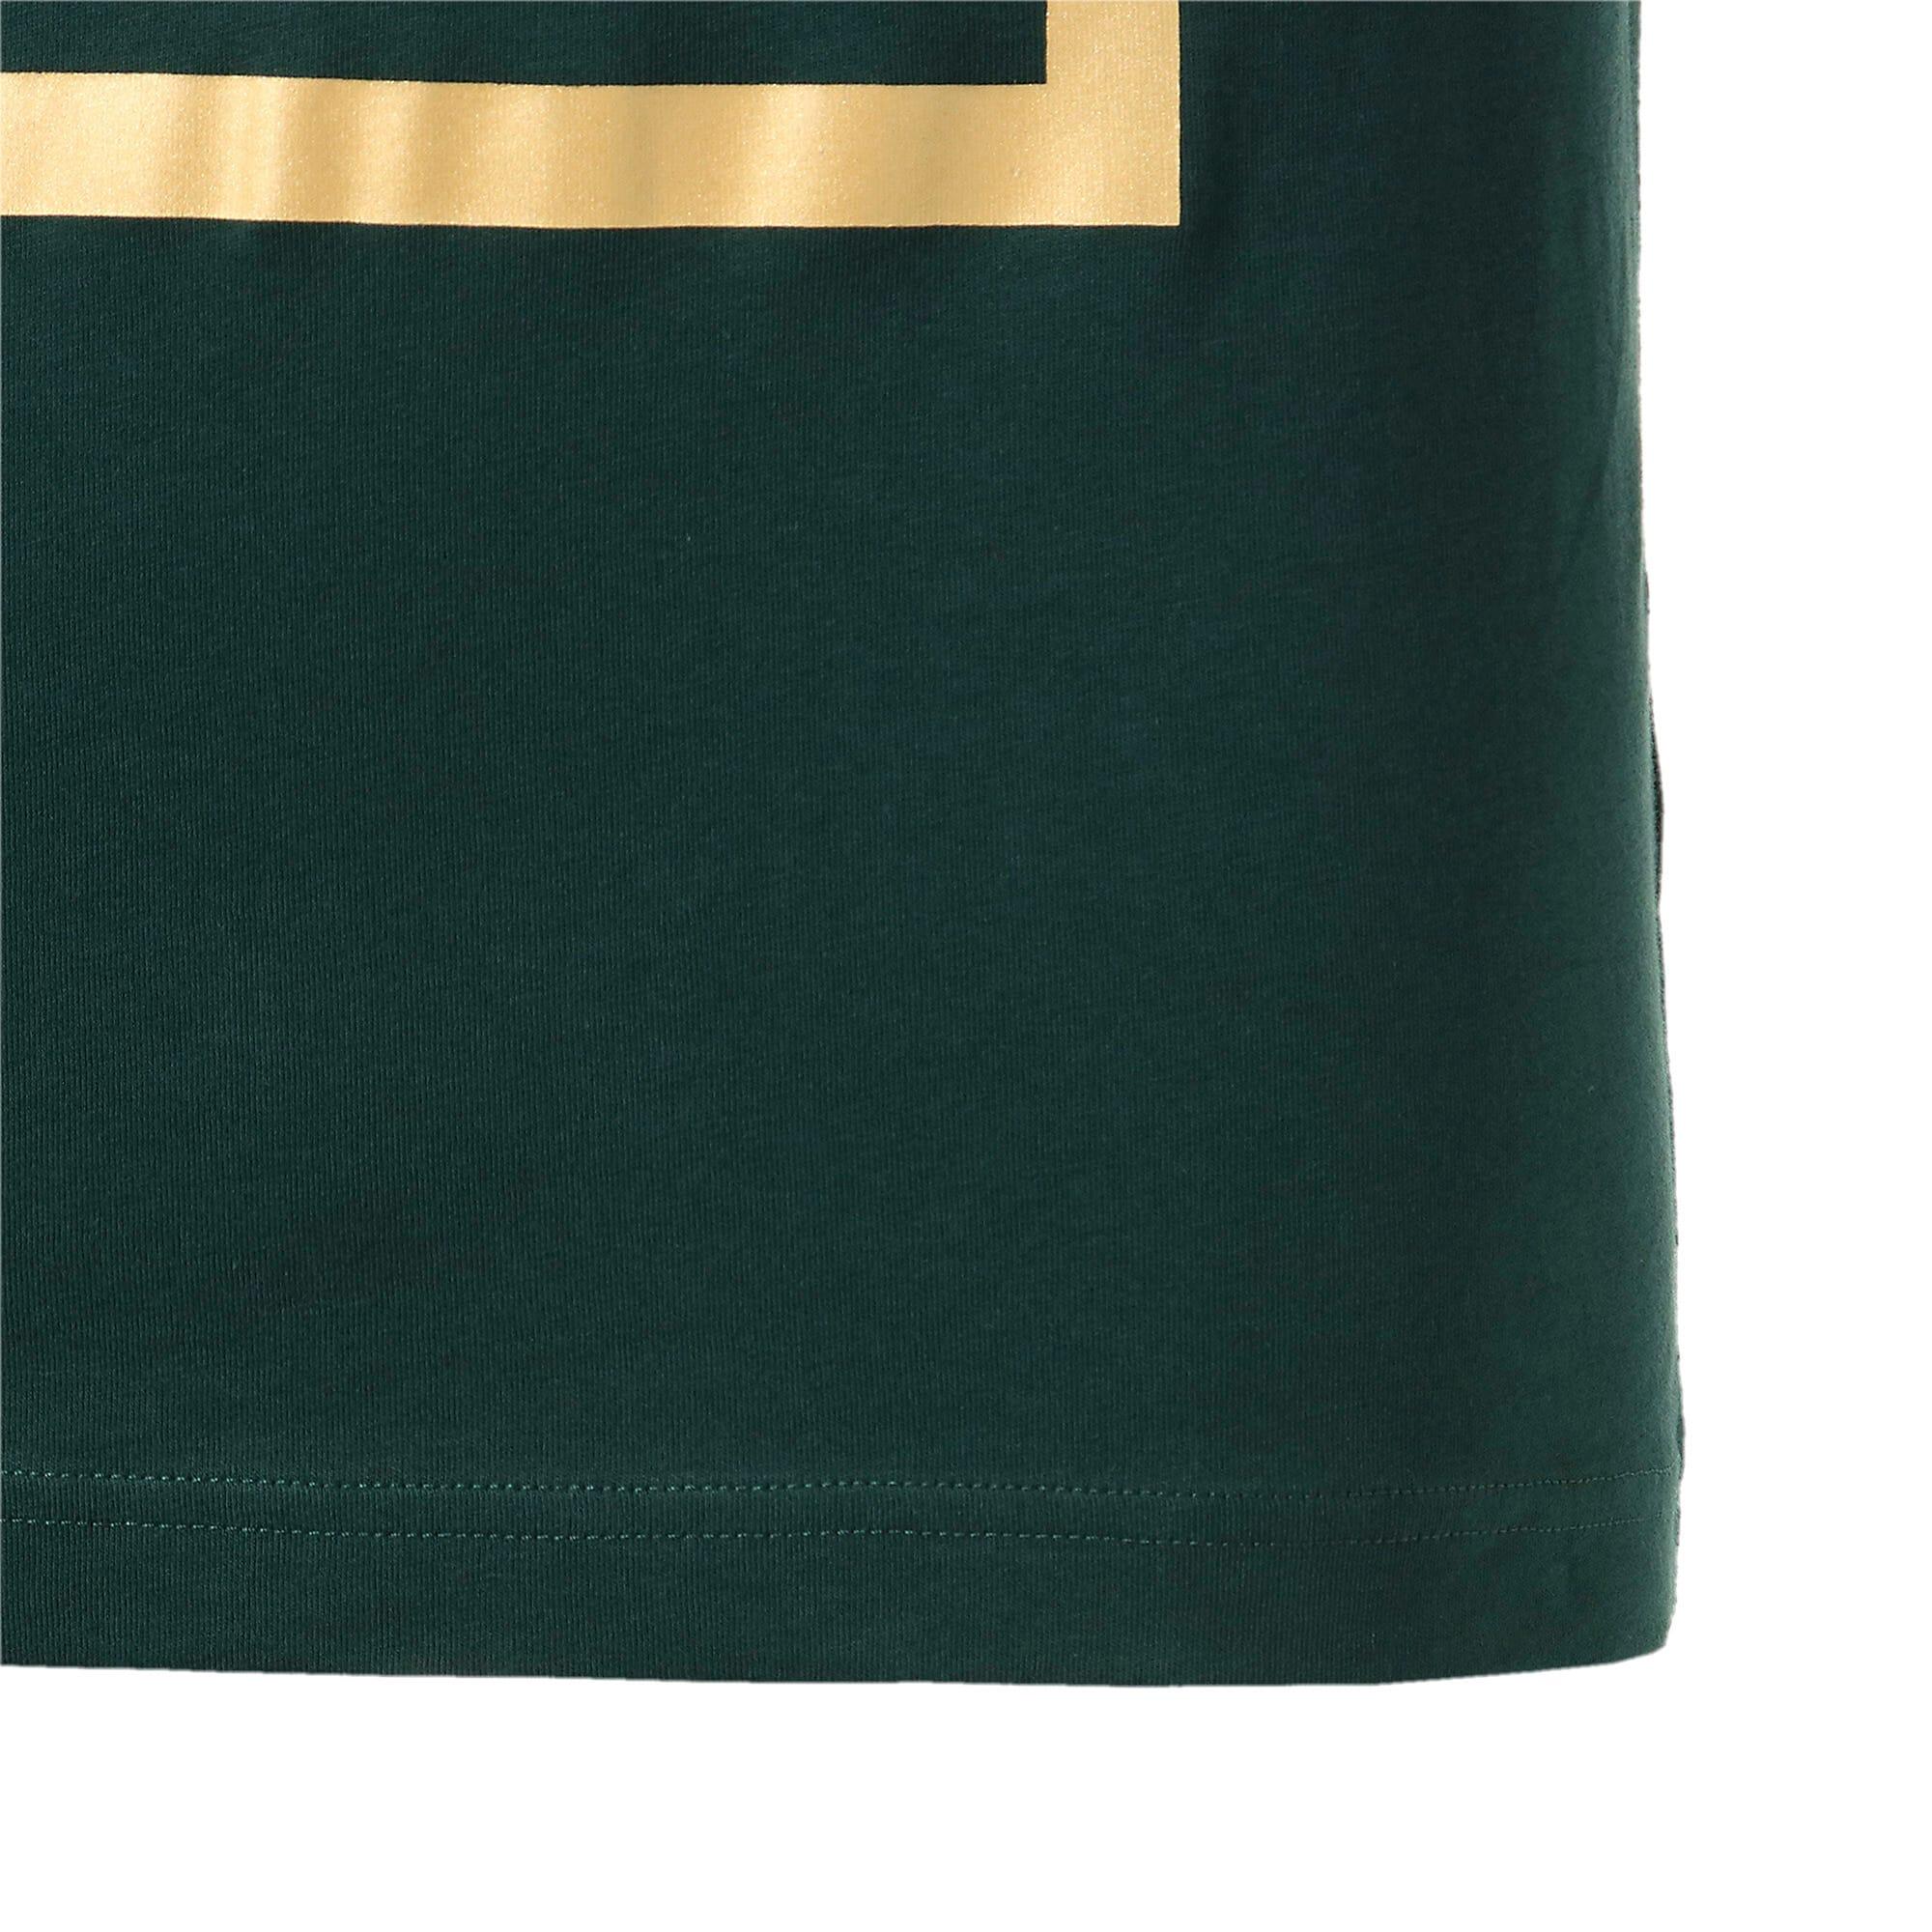 Thumbnail 6 of FIGC イタリア PUMA DNA Tシャツ 半袖, Ponderosa Pine-Team gold, medium-JPN